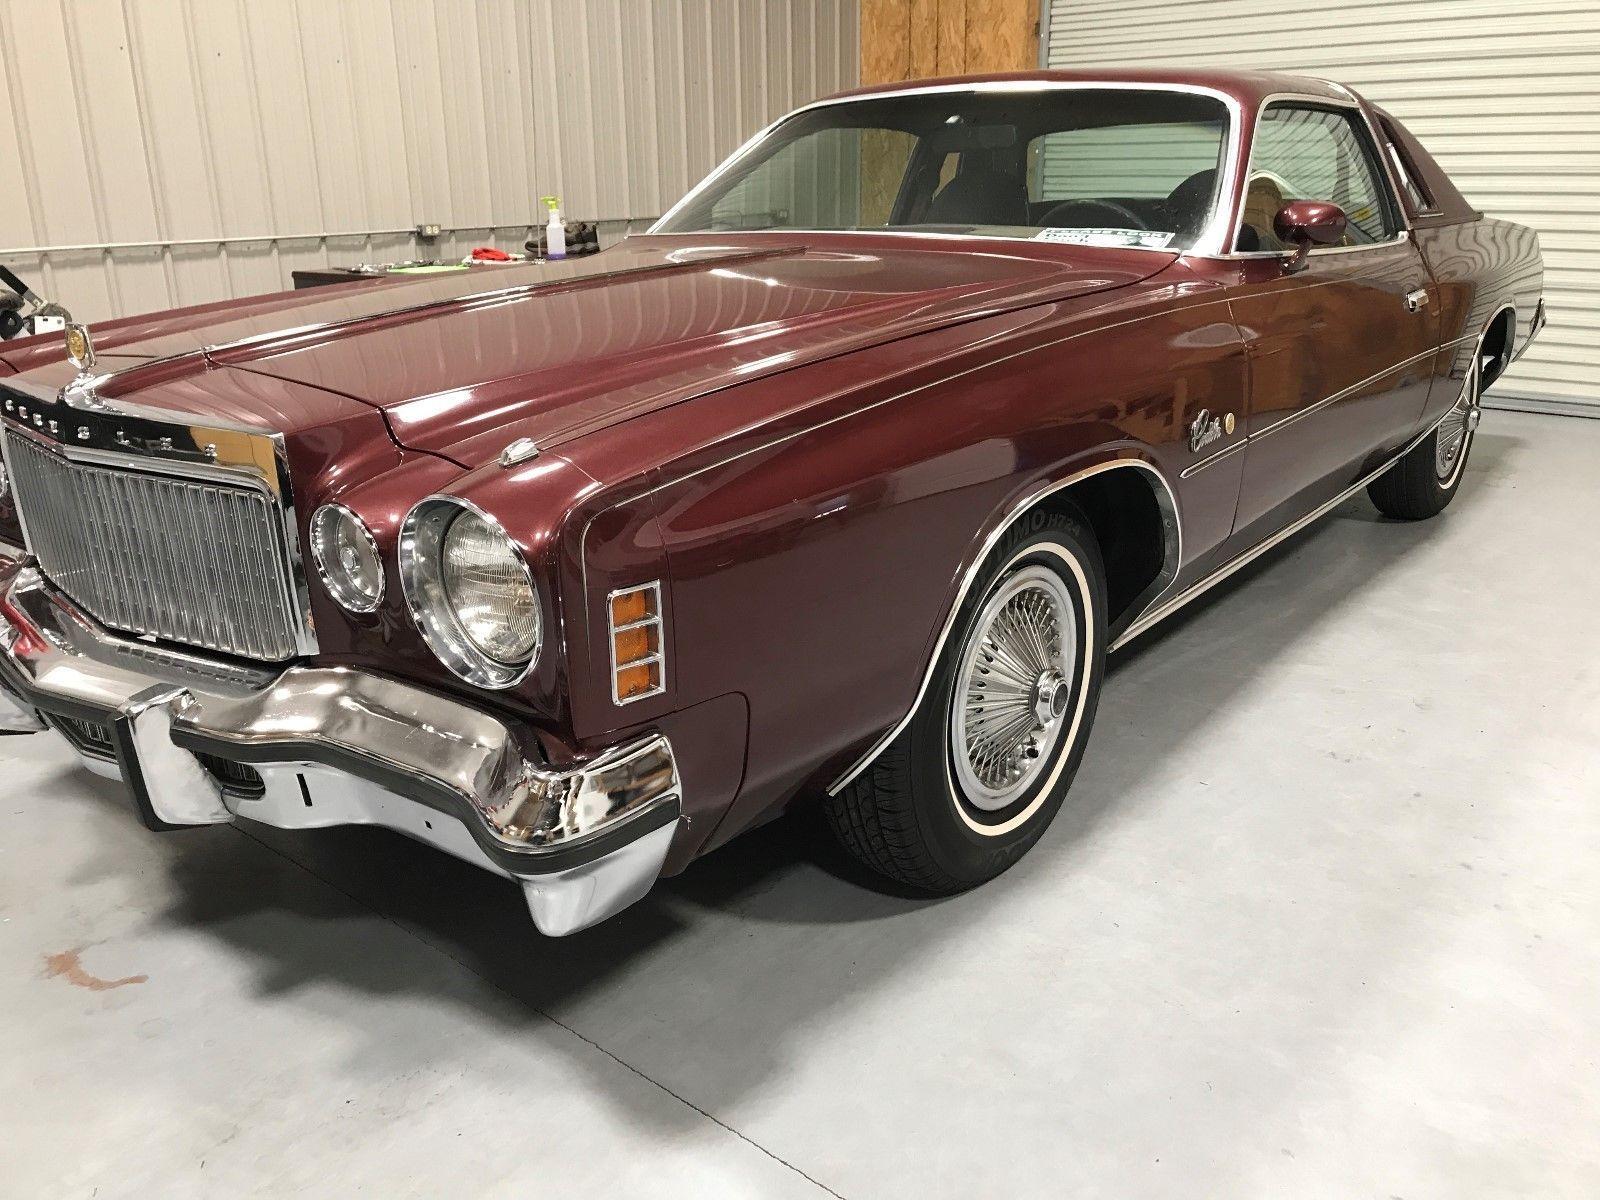 1977 Chrysler Cordoba | Rust free, Luxury auto and Cars